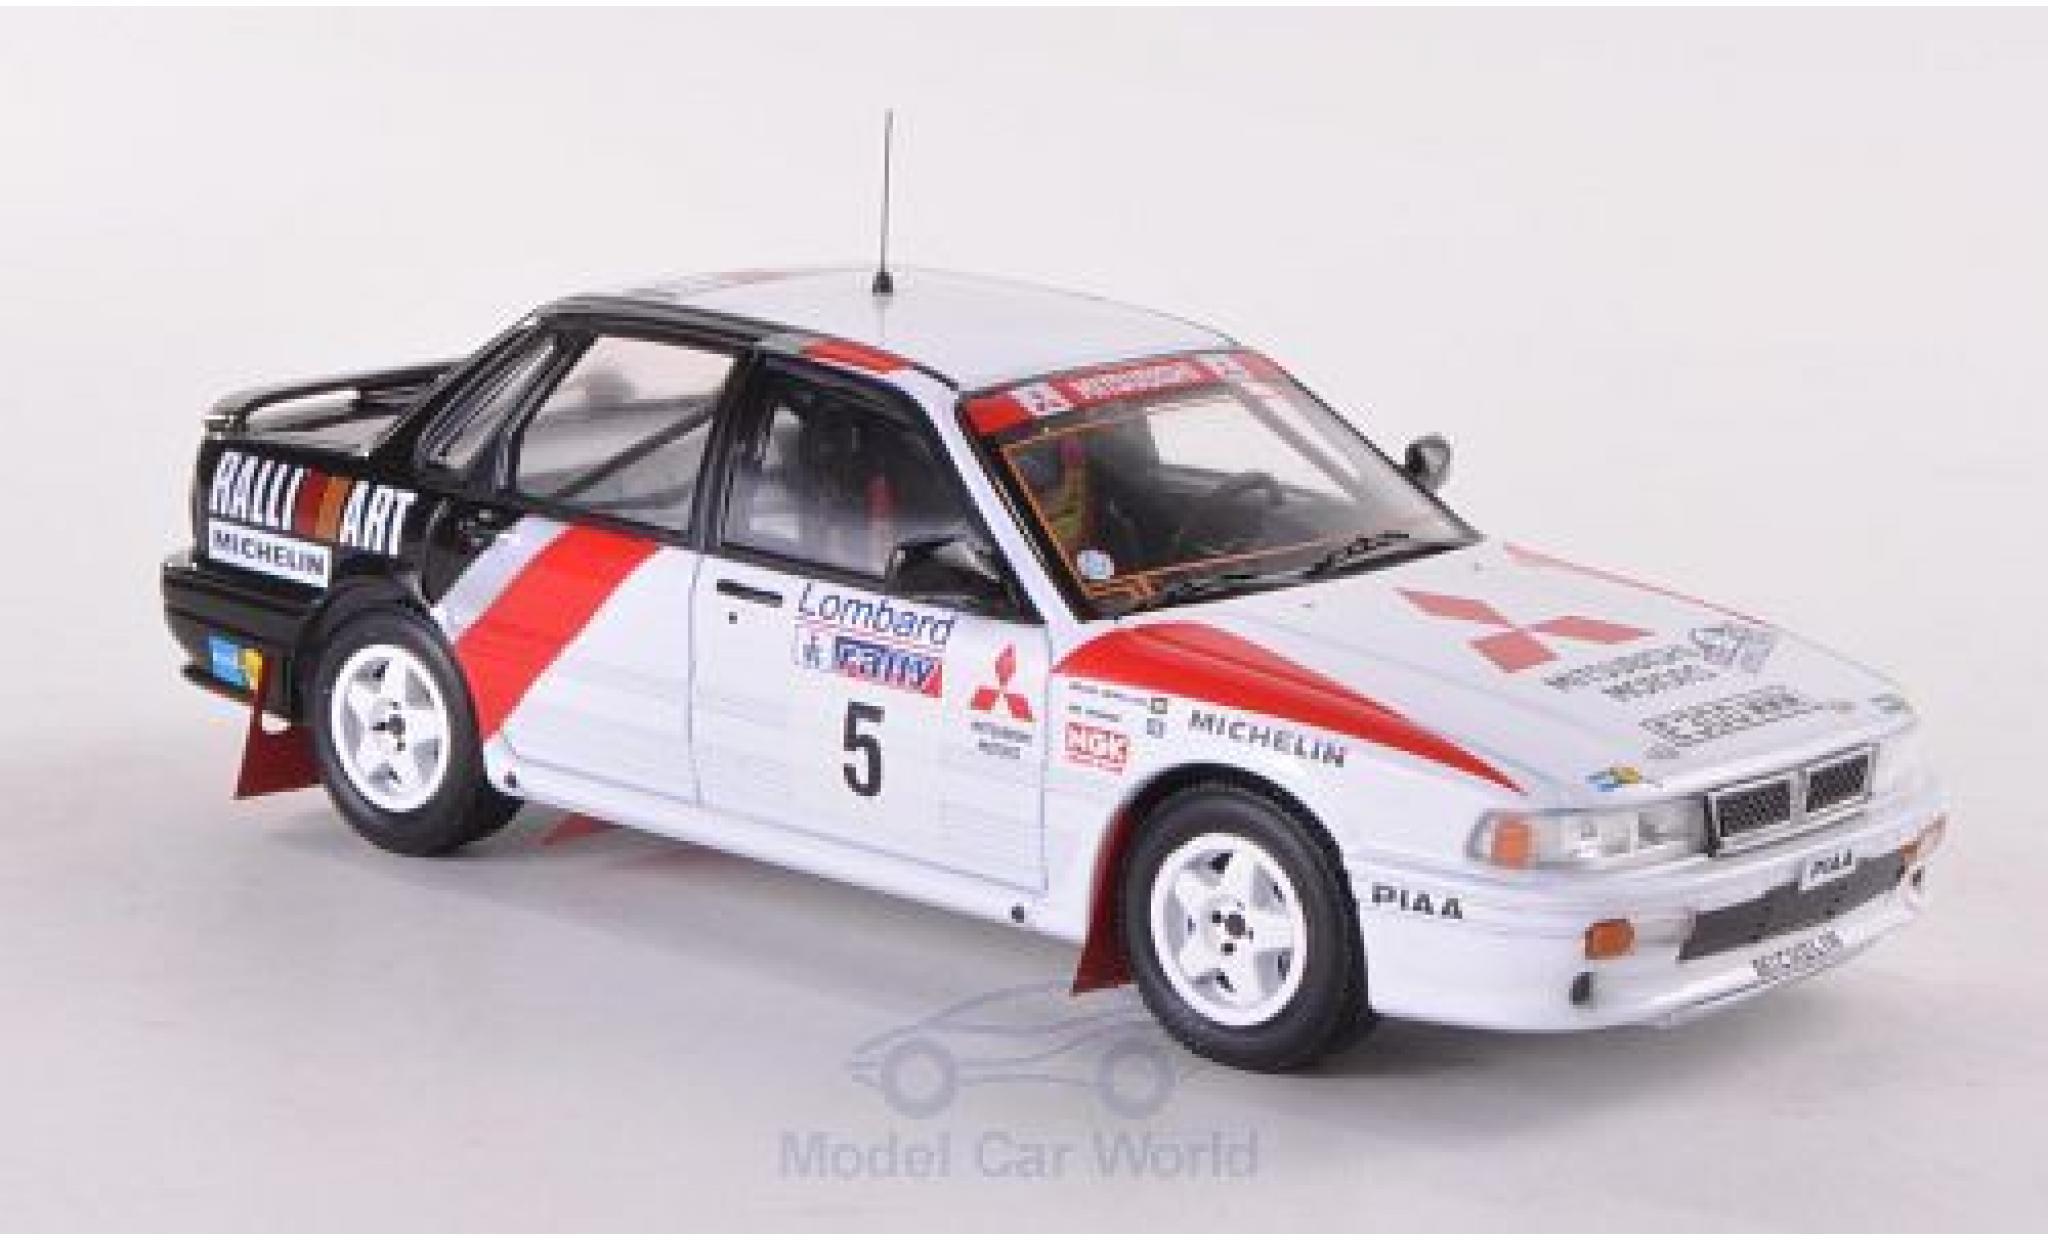 Mitsubishi Galant 1/43 IXO VR-4 Ralliart RAC Rallye 1988